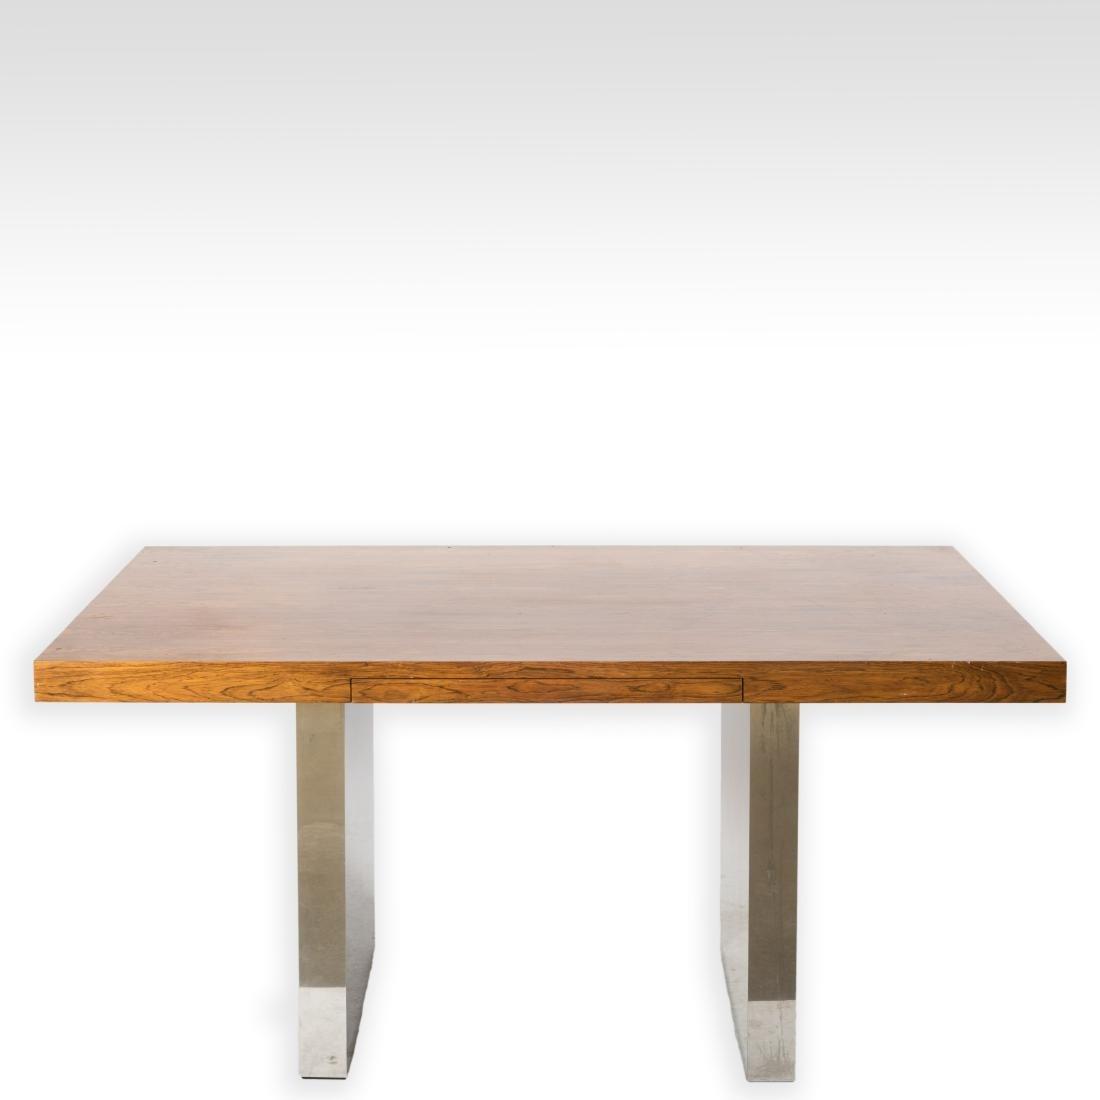 Dunbar Rosewood and Chrome Desk - Signed